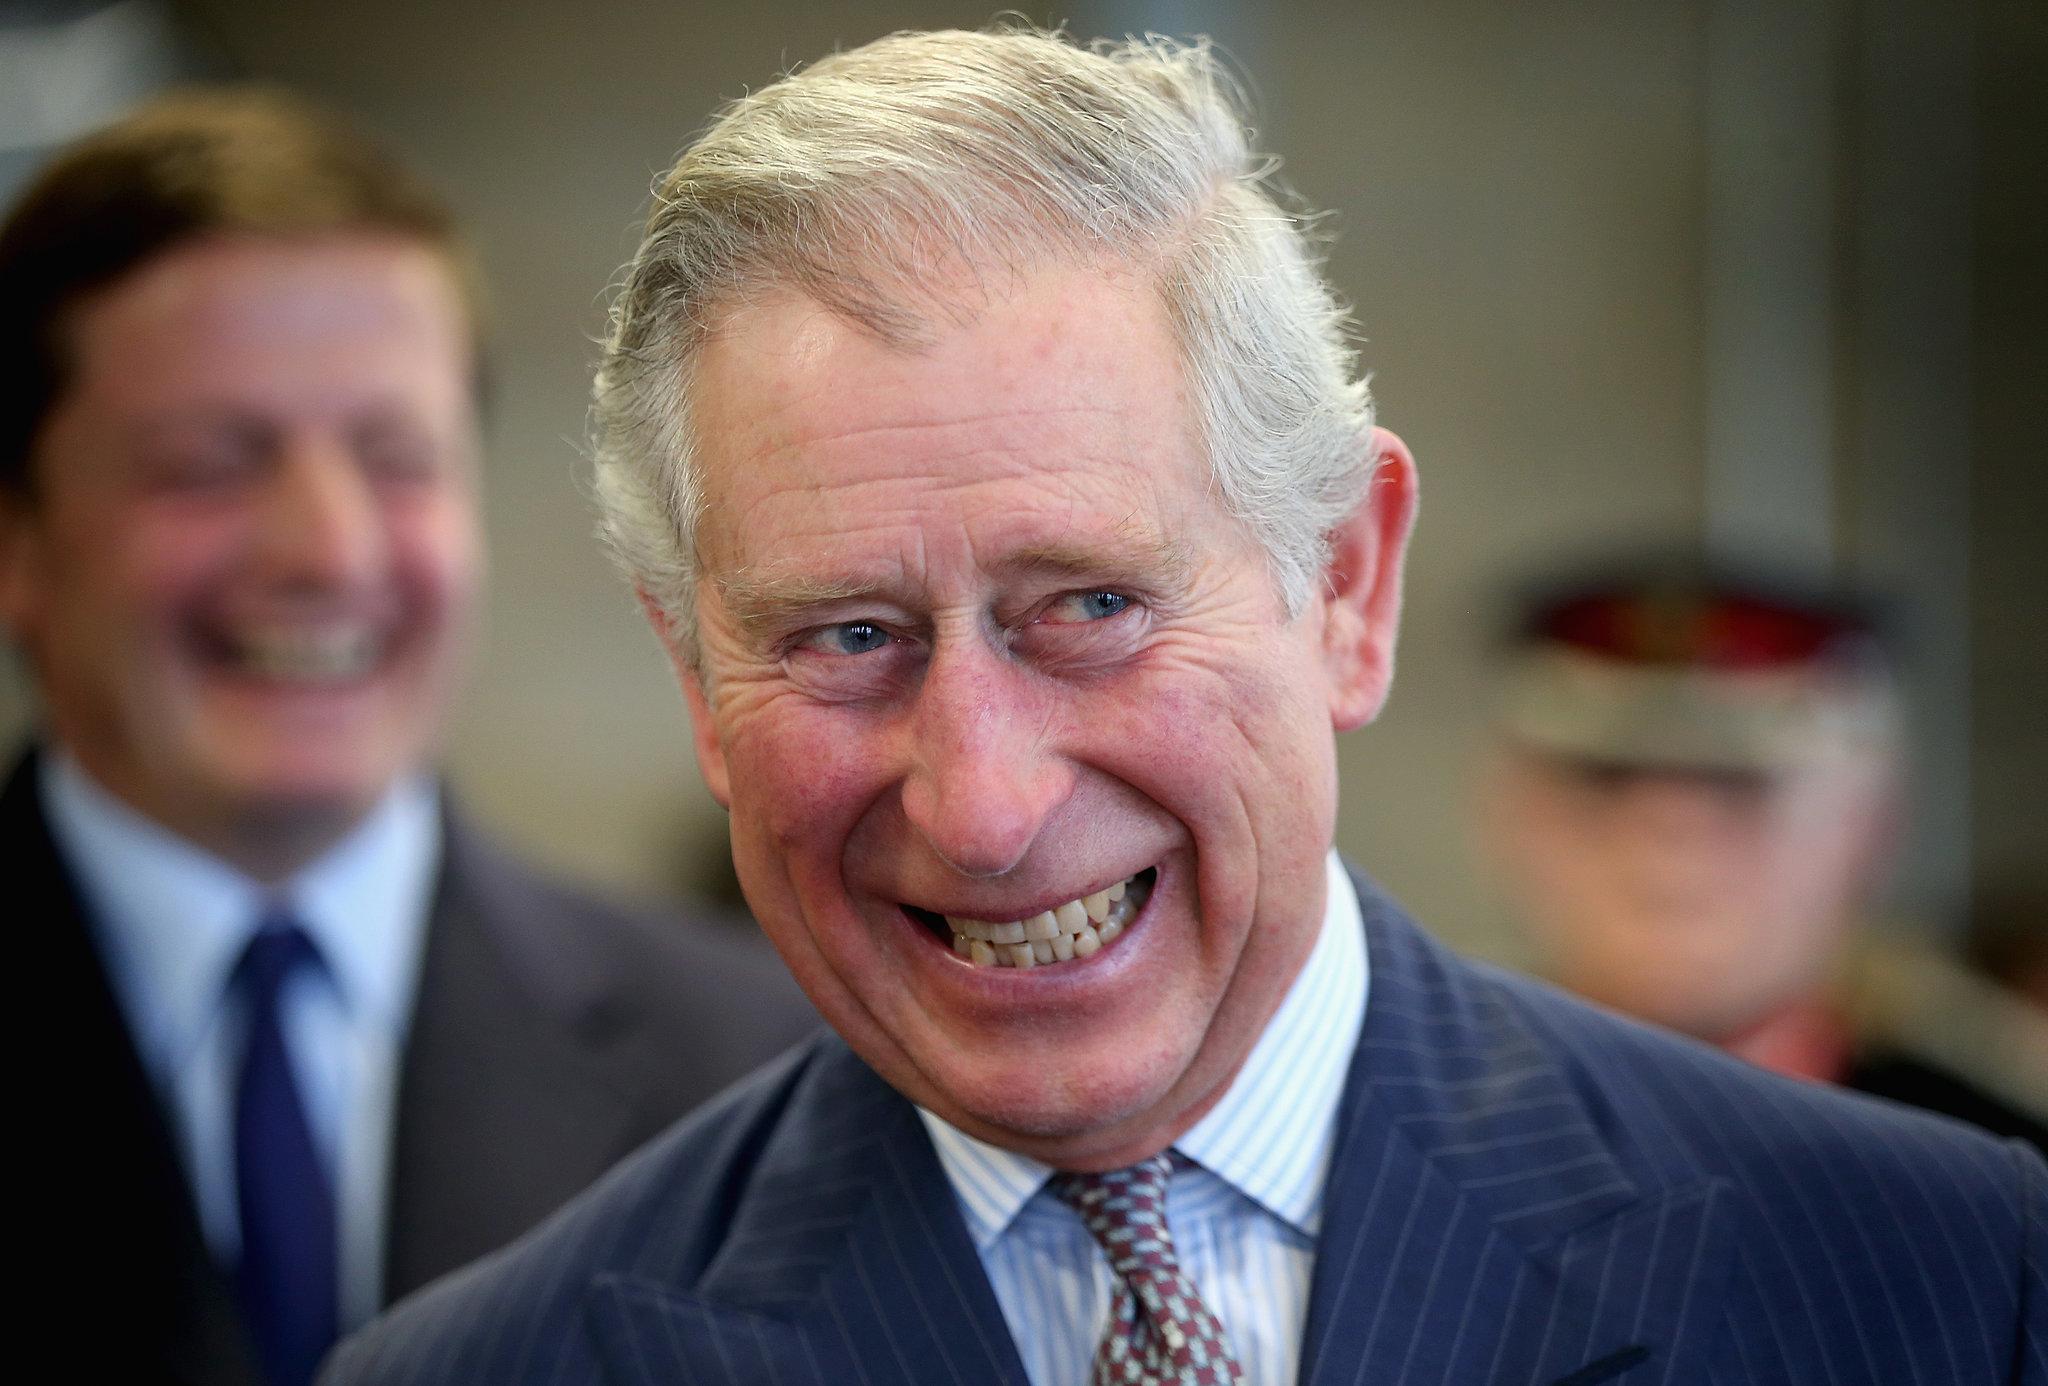 You think Princes Charles is just misunderstood.